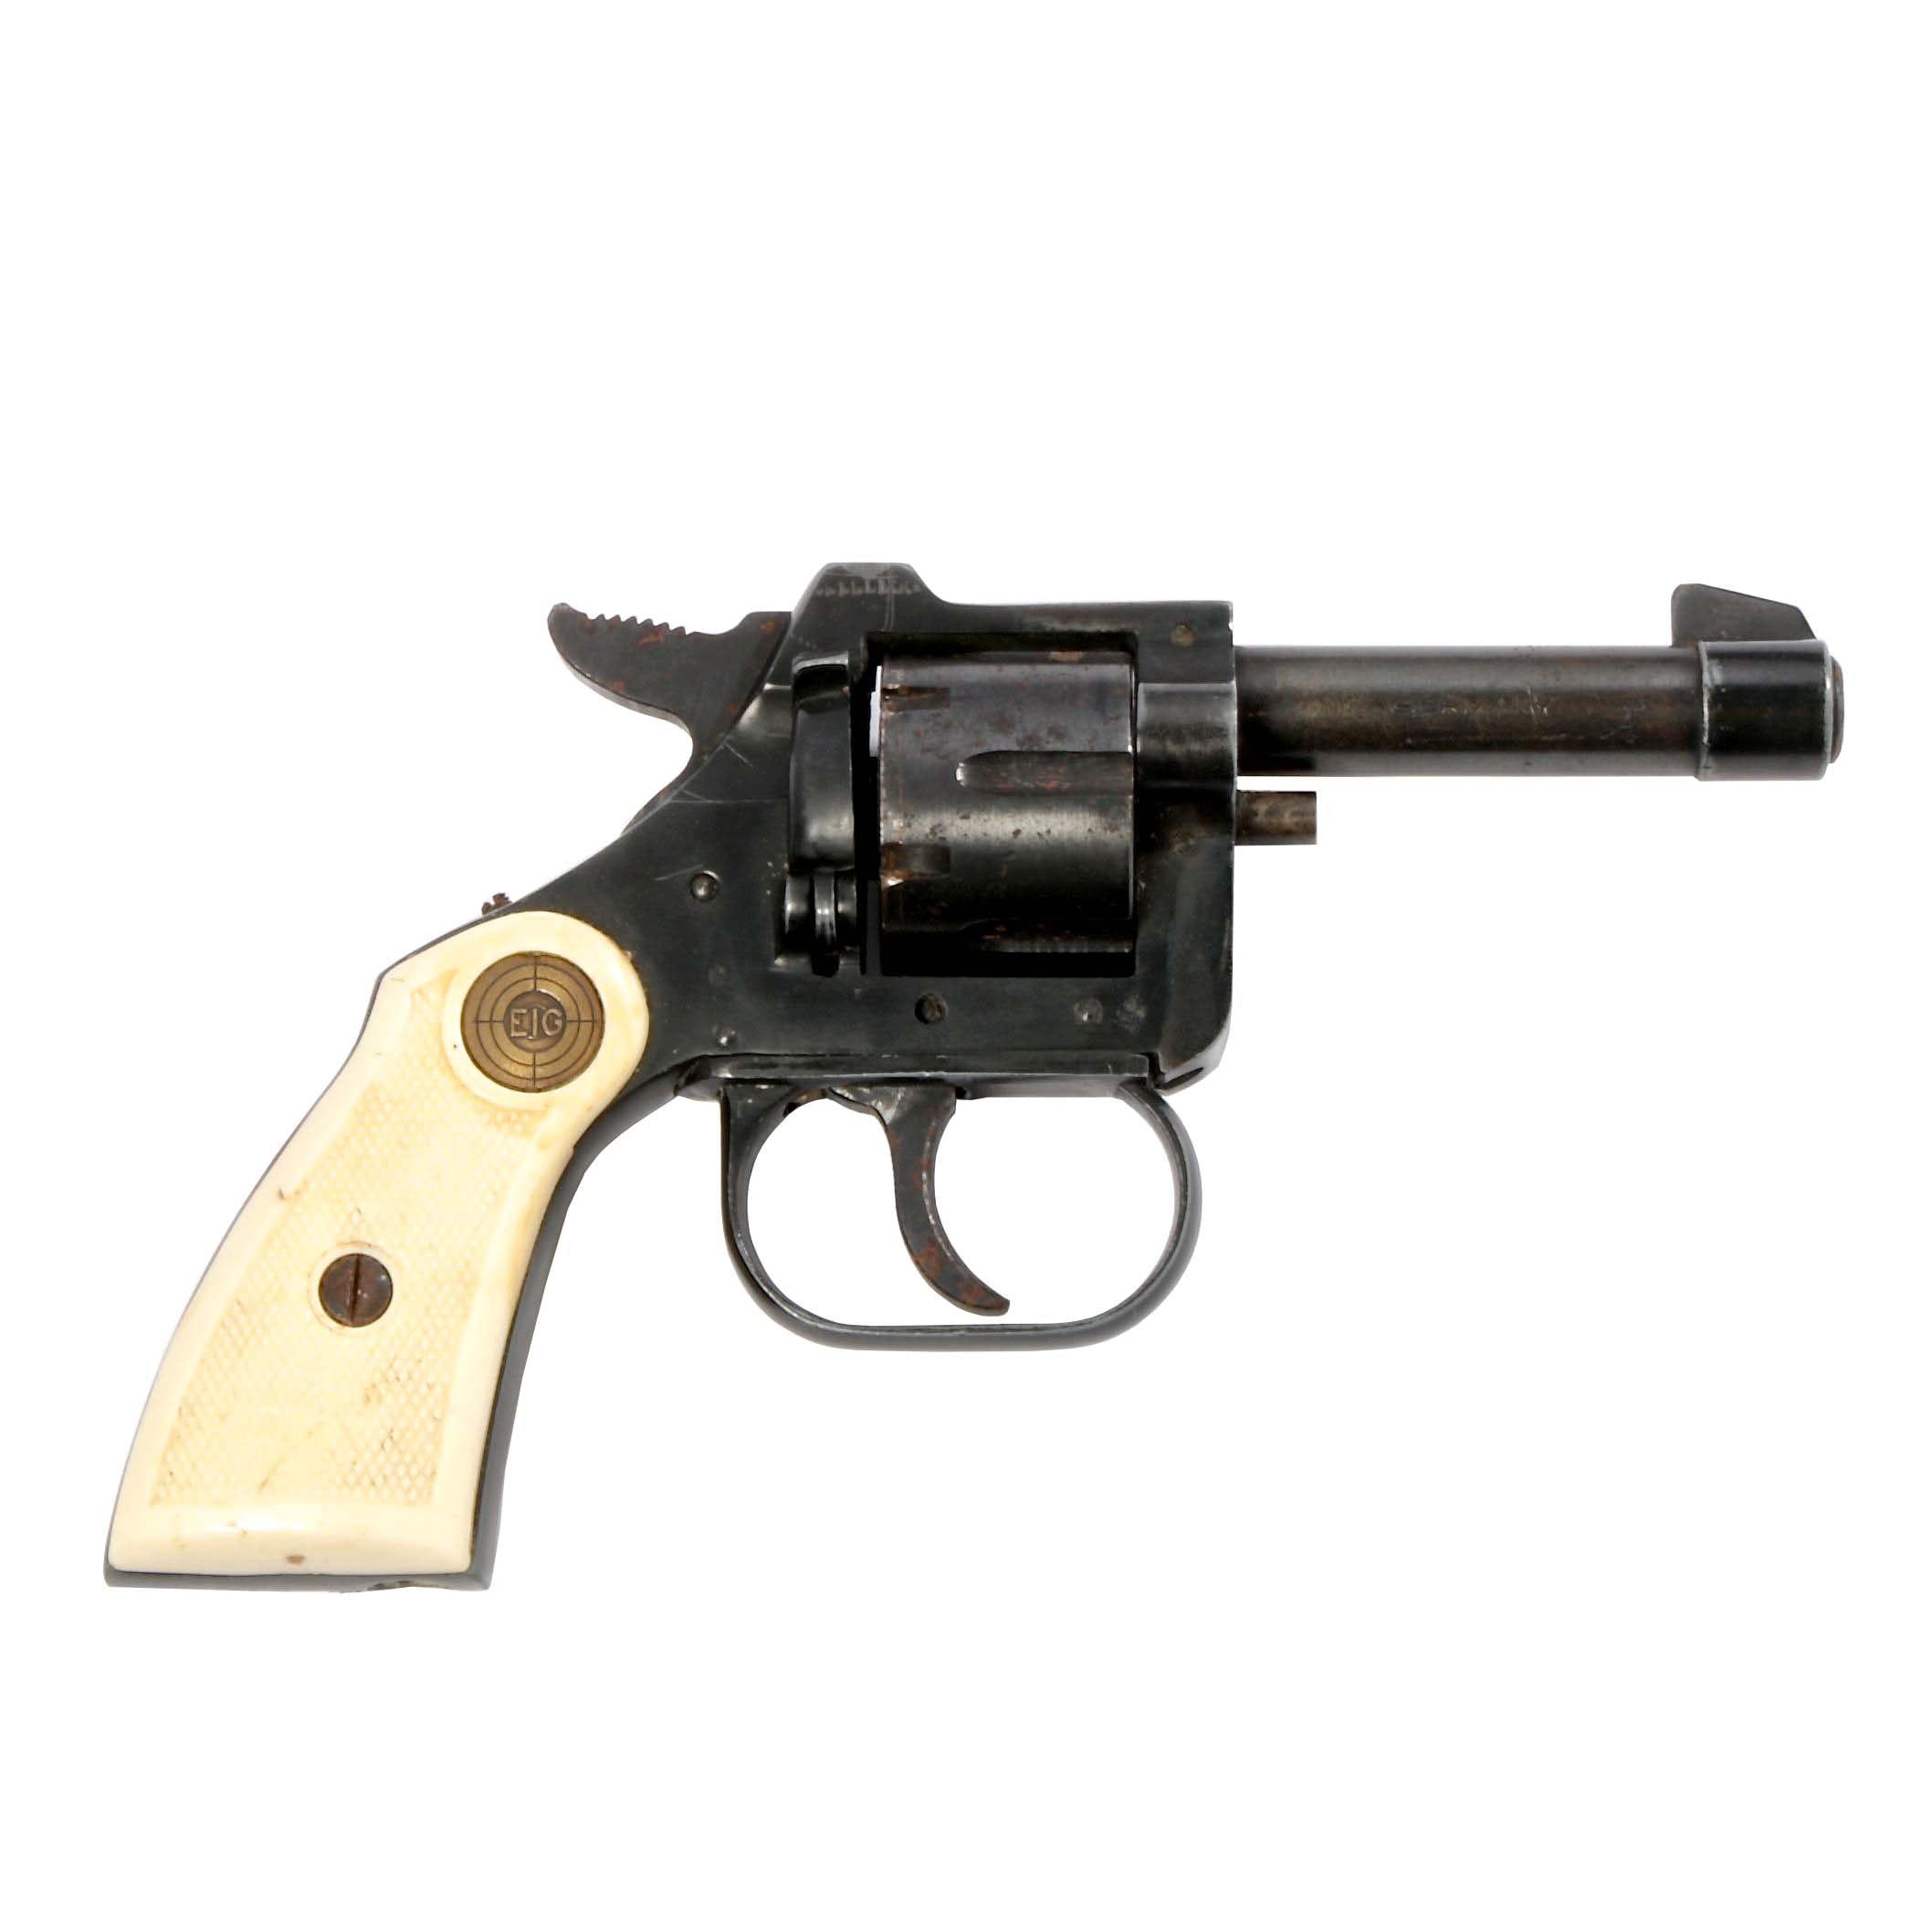 1962 Rohm RG10 .22 Short Six-Shot Revolver